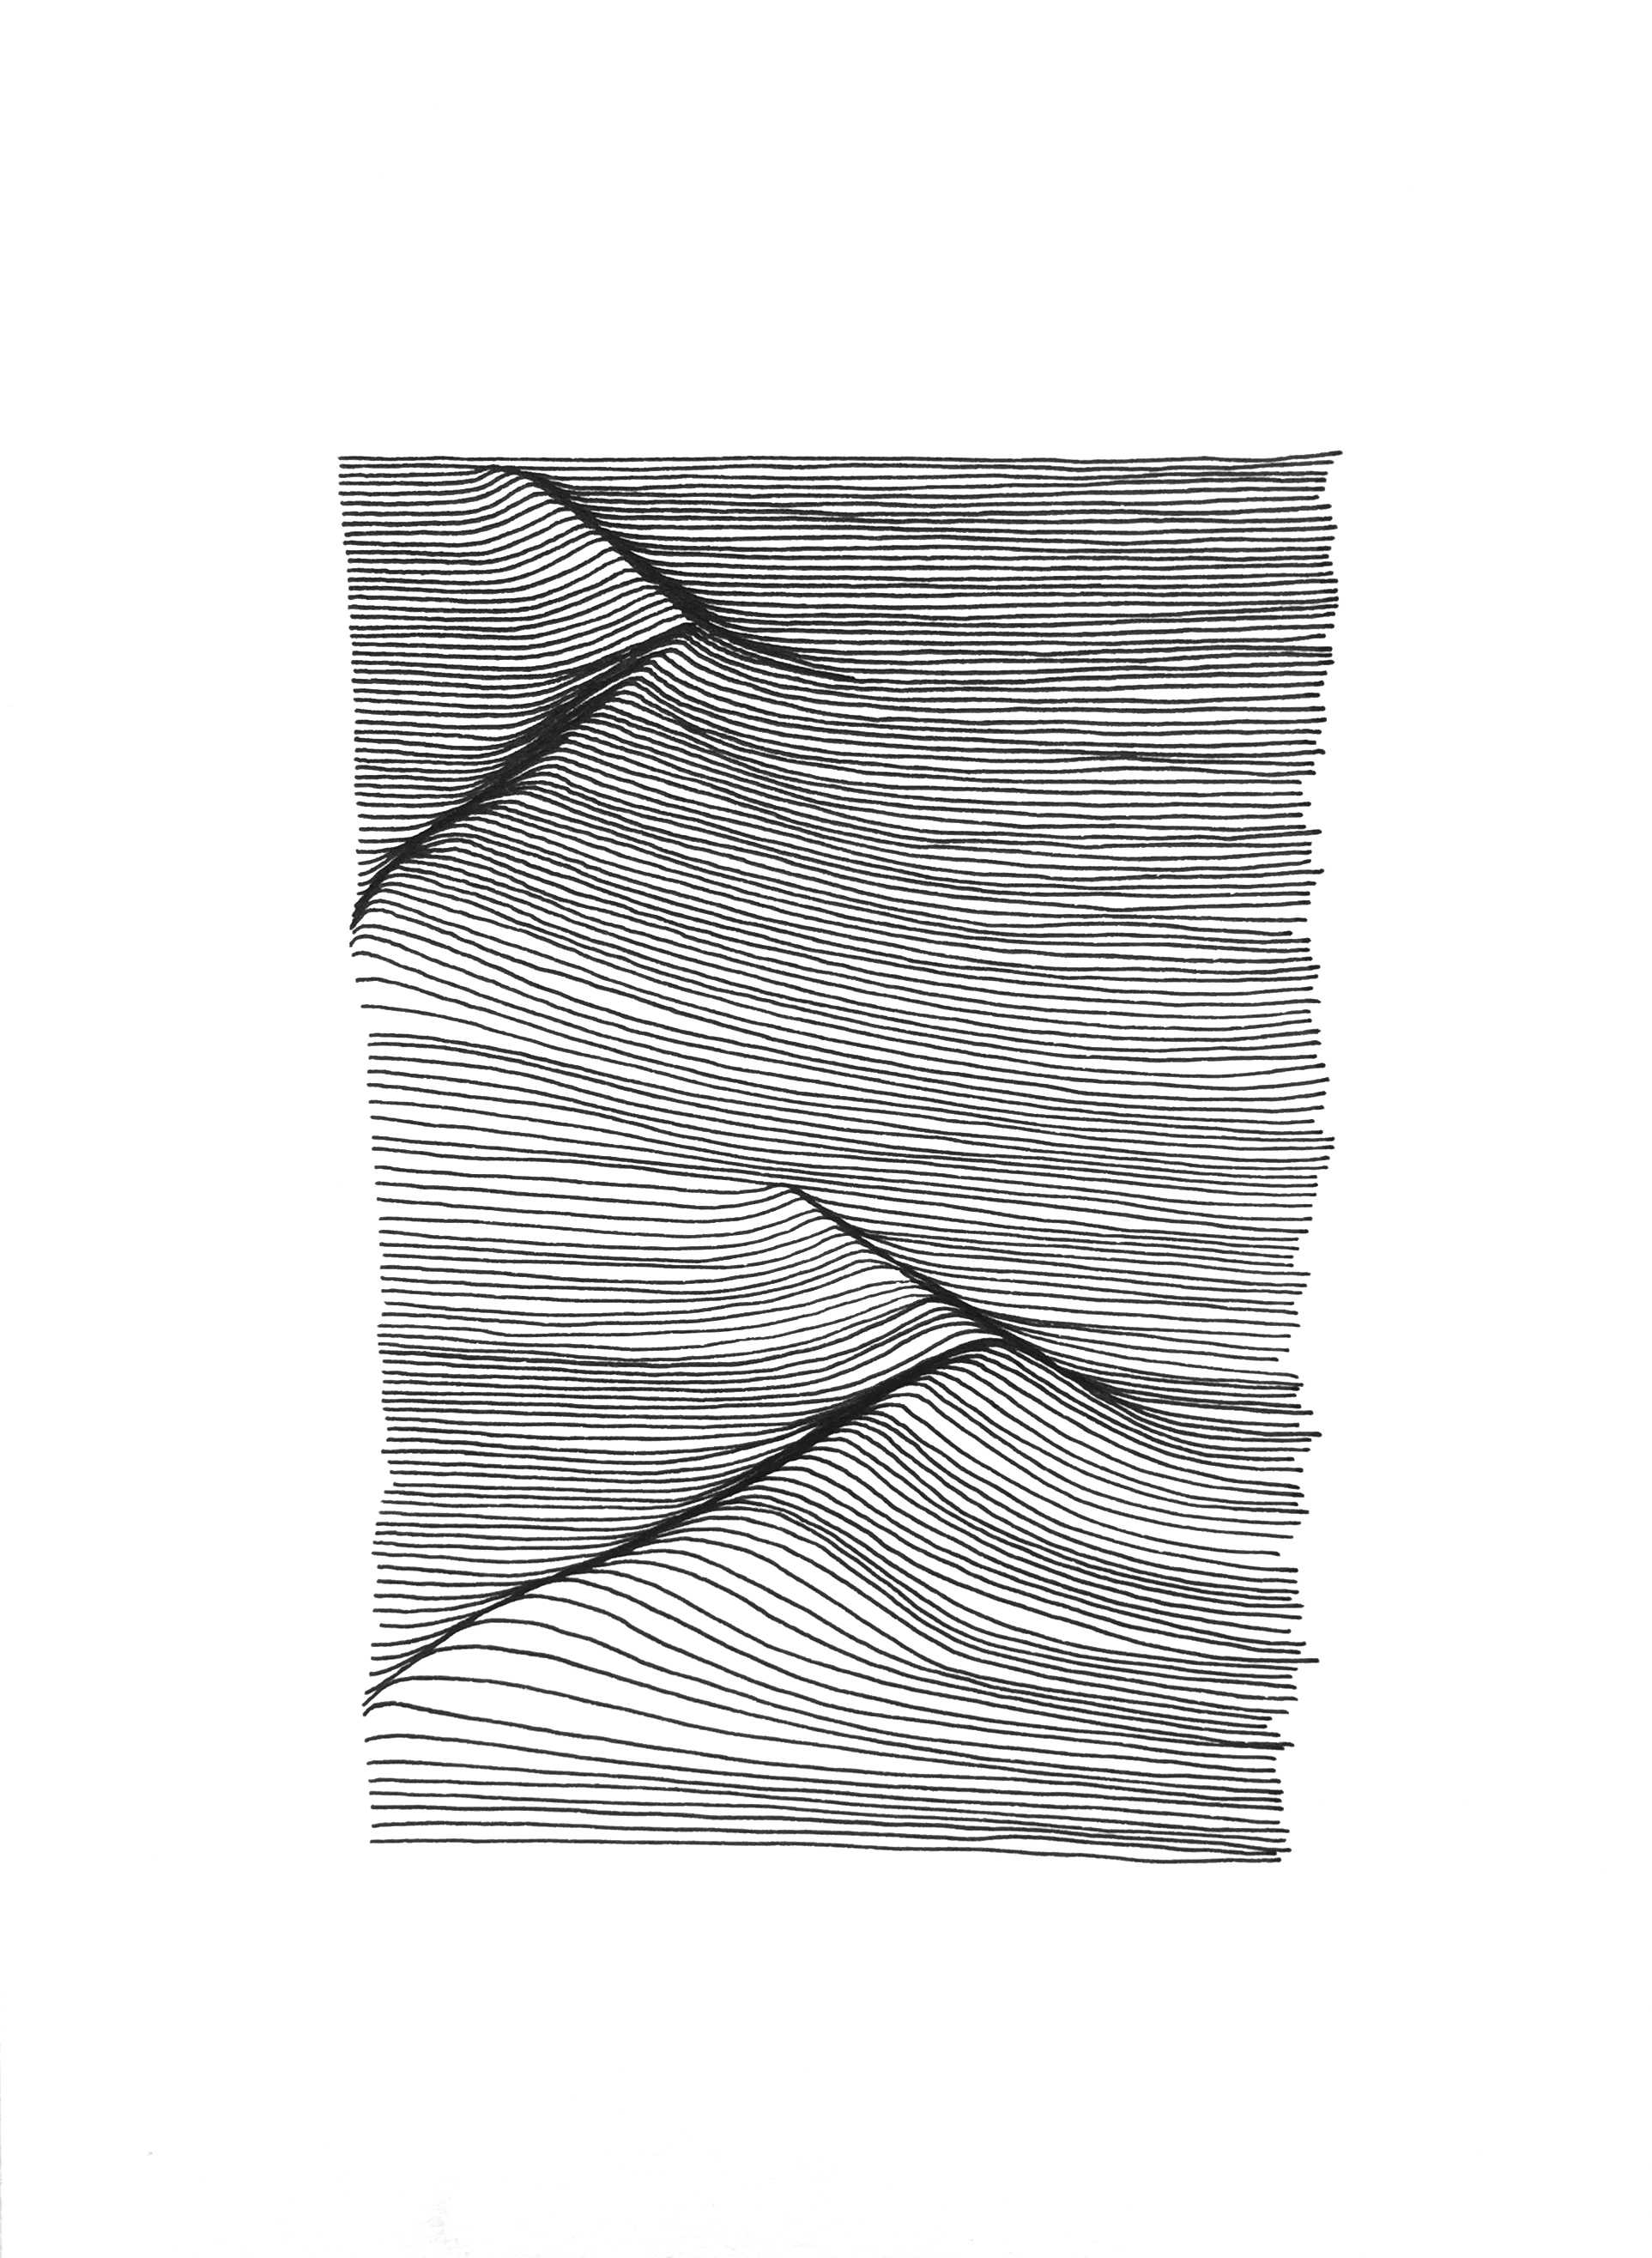 The Minimalist Wave The Minimalist Wave